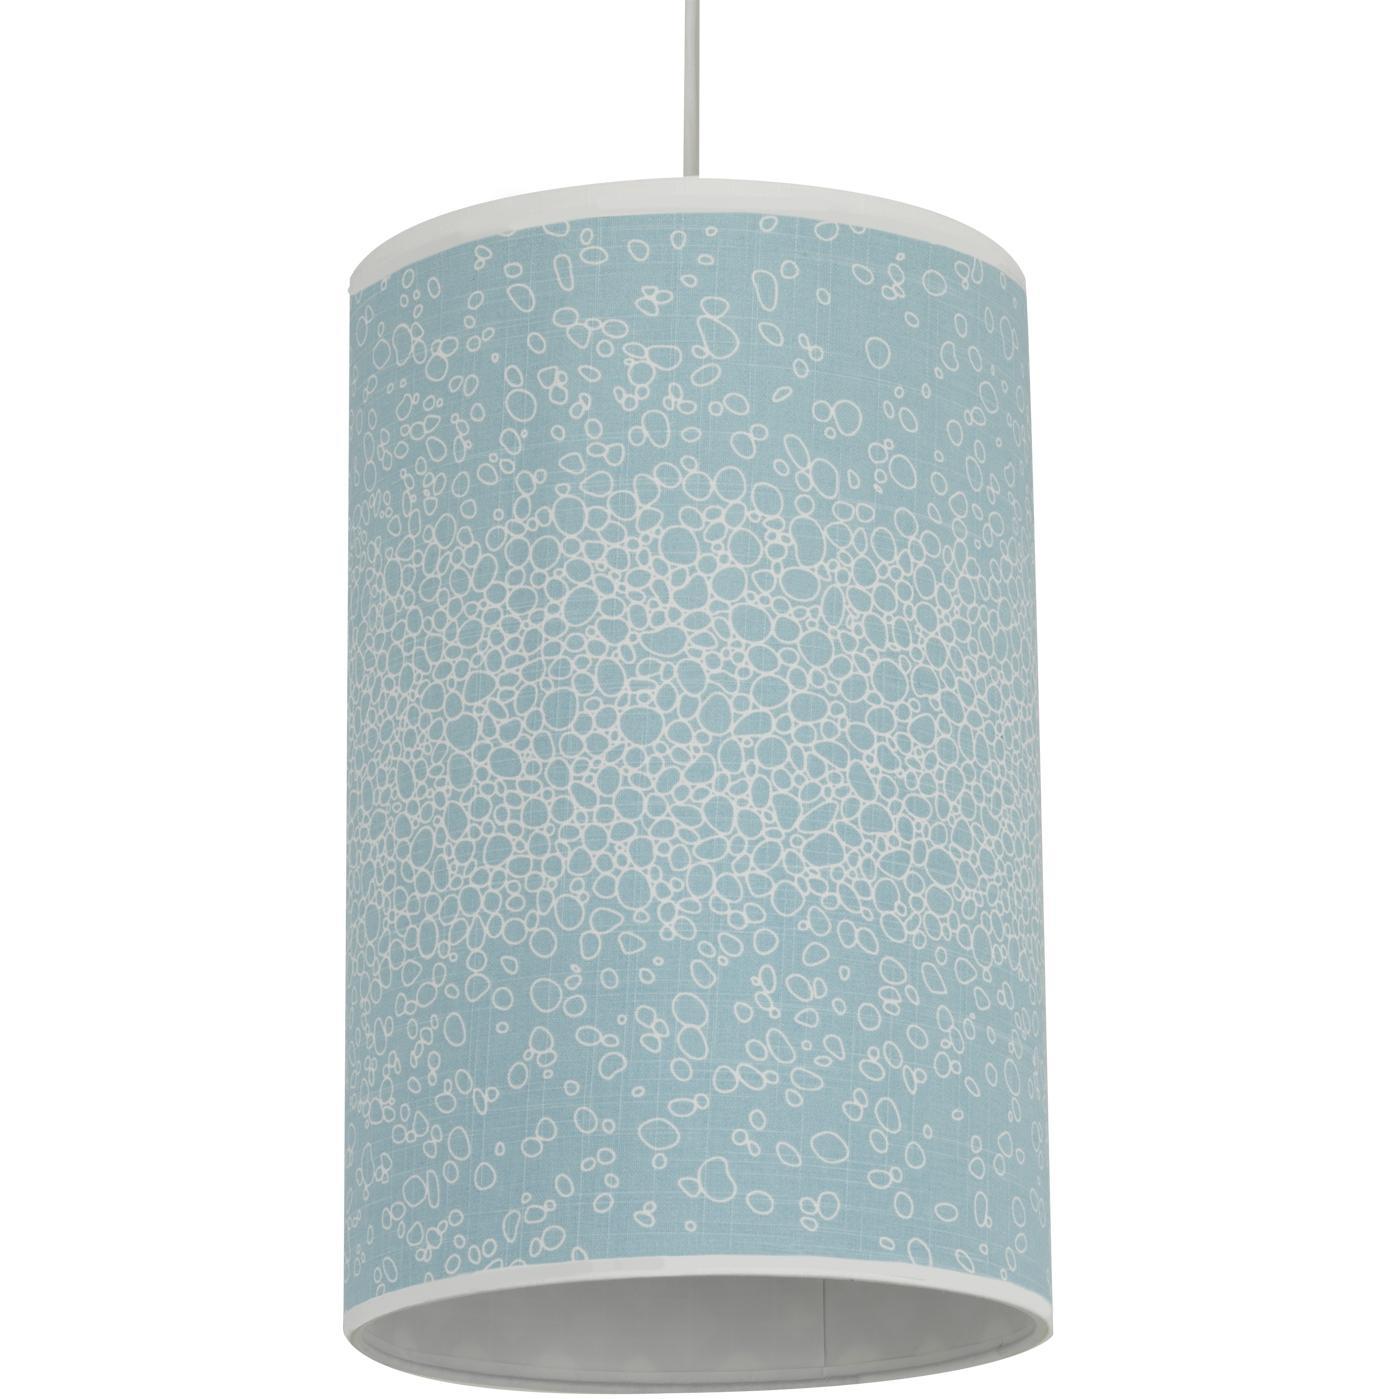 Oilo Cylinder Hanging Lamp - Raindrops Aqua